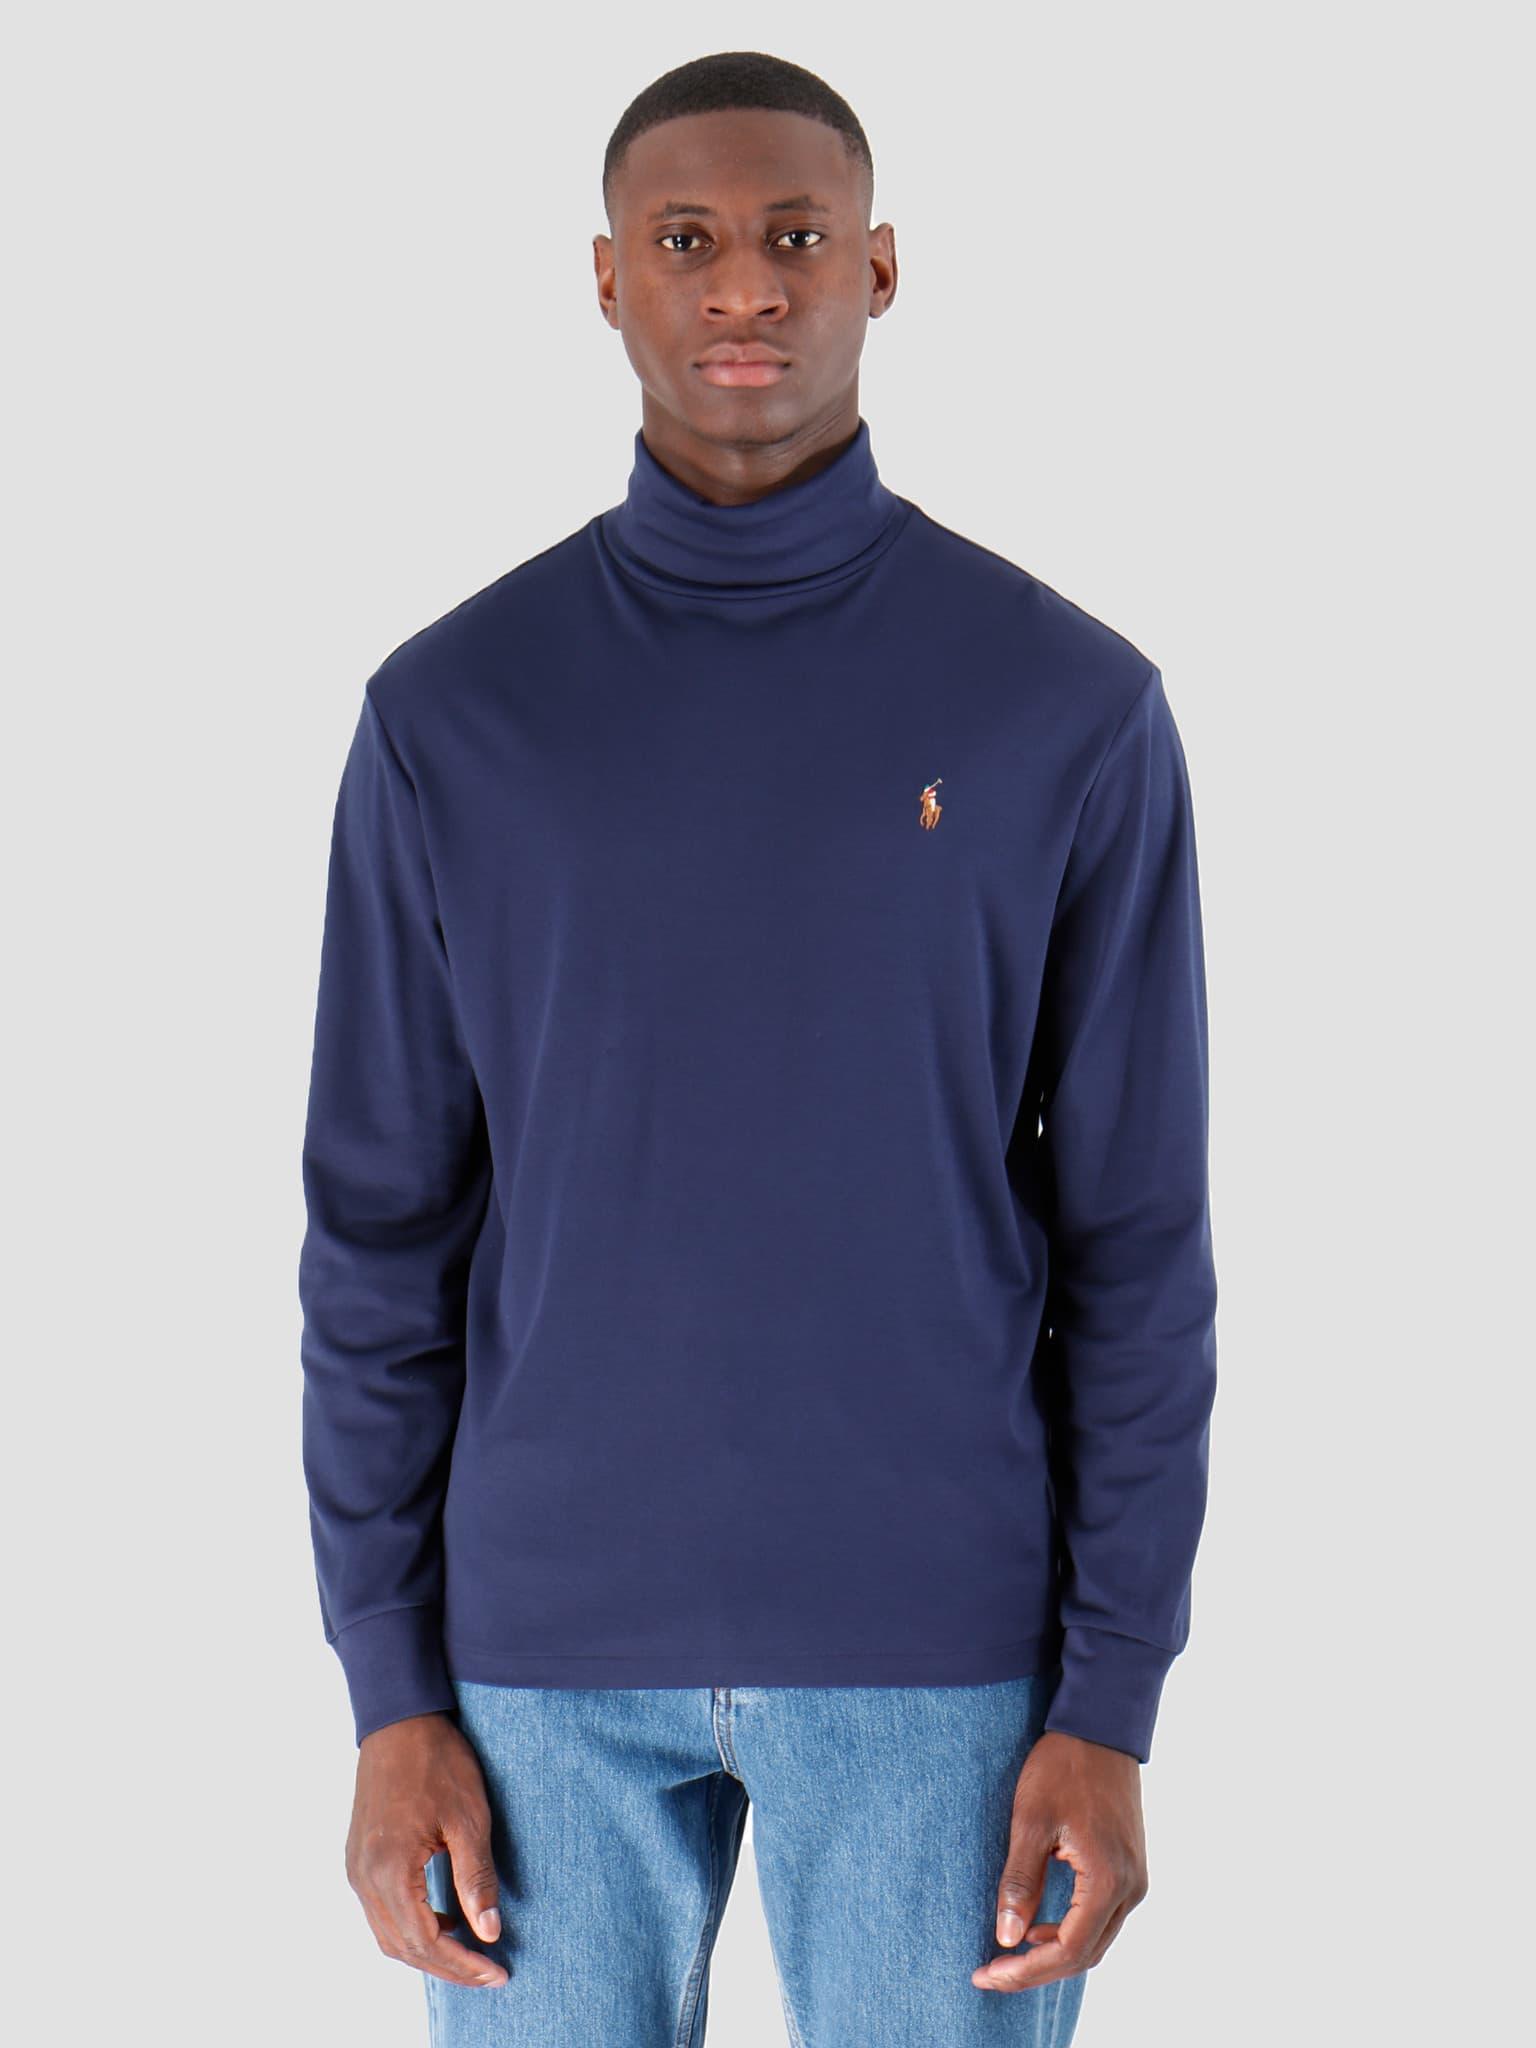 Lsturtlem1 Long Sleeve Knit French Navy 710760126003